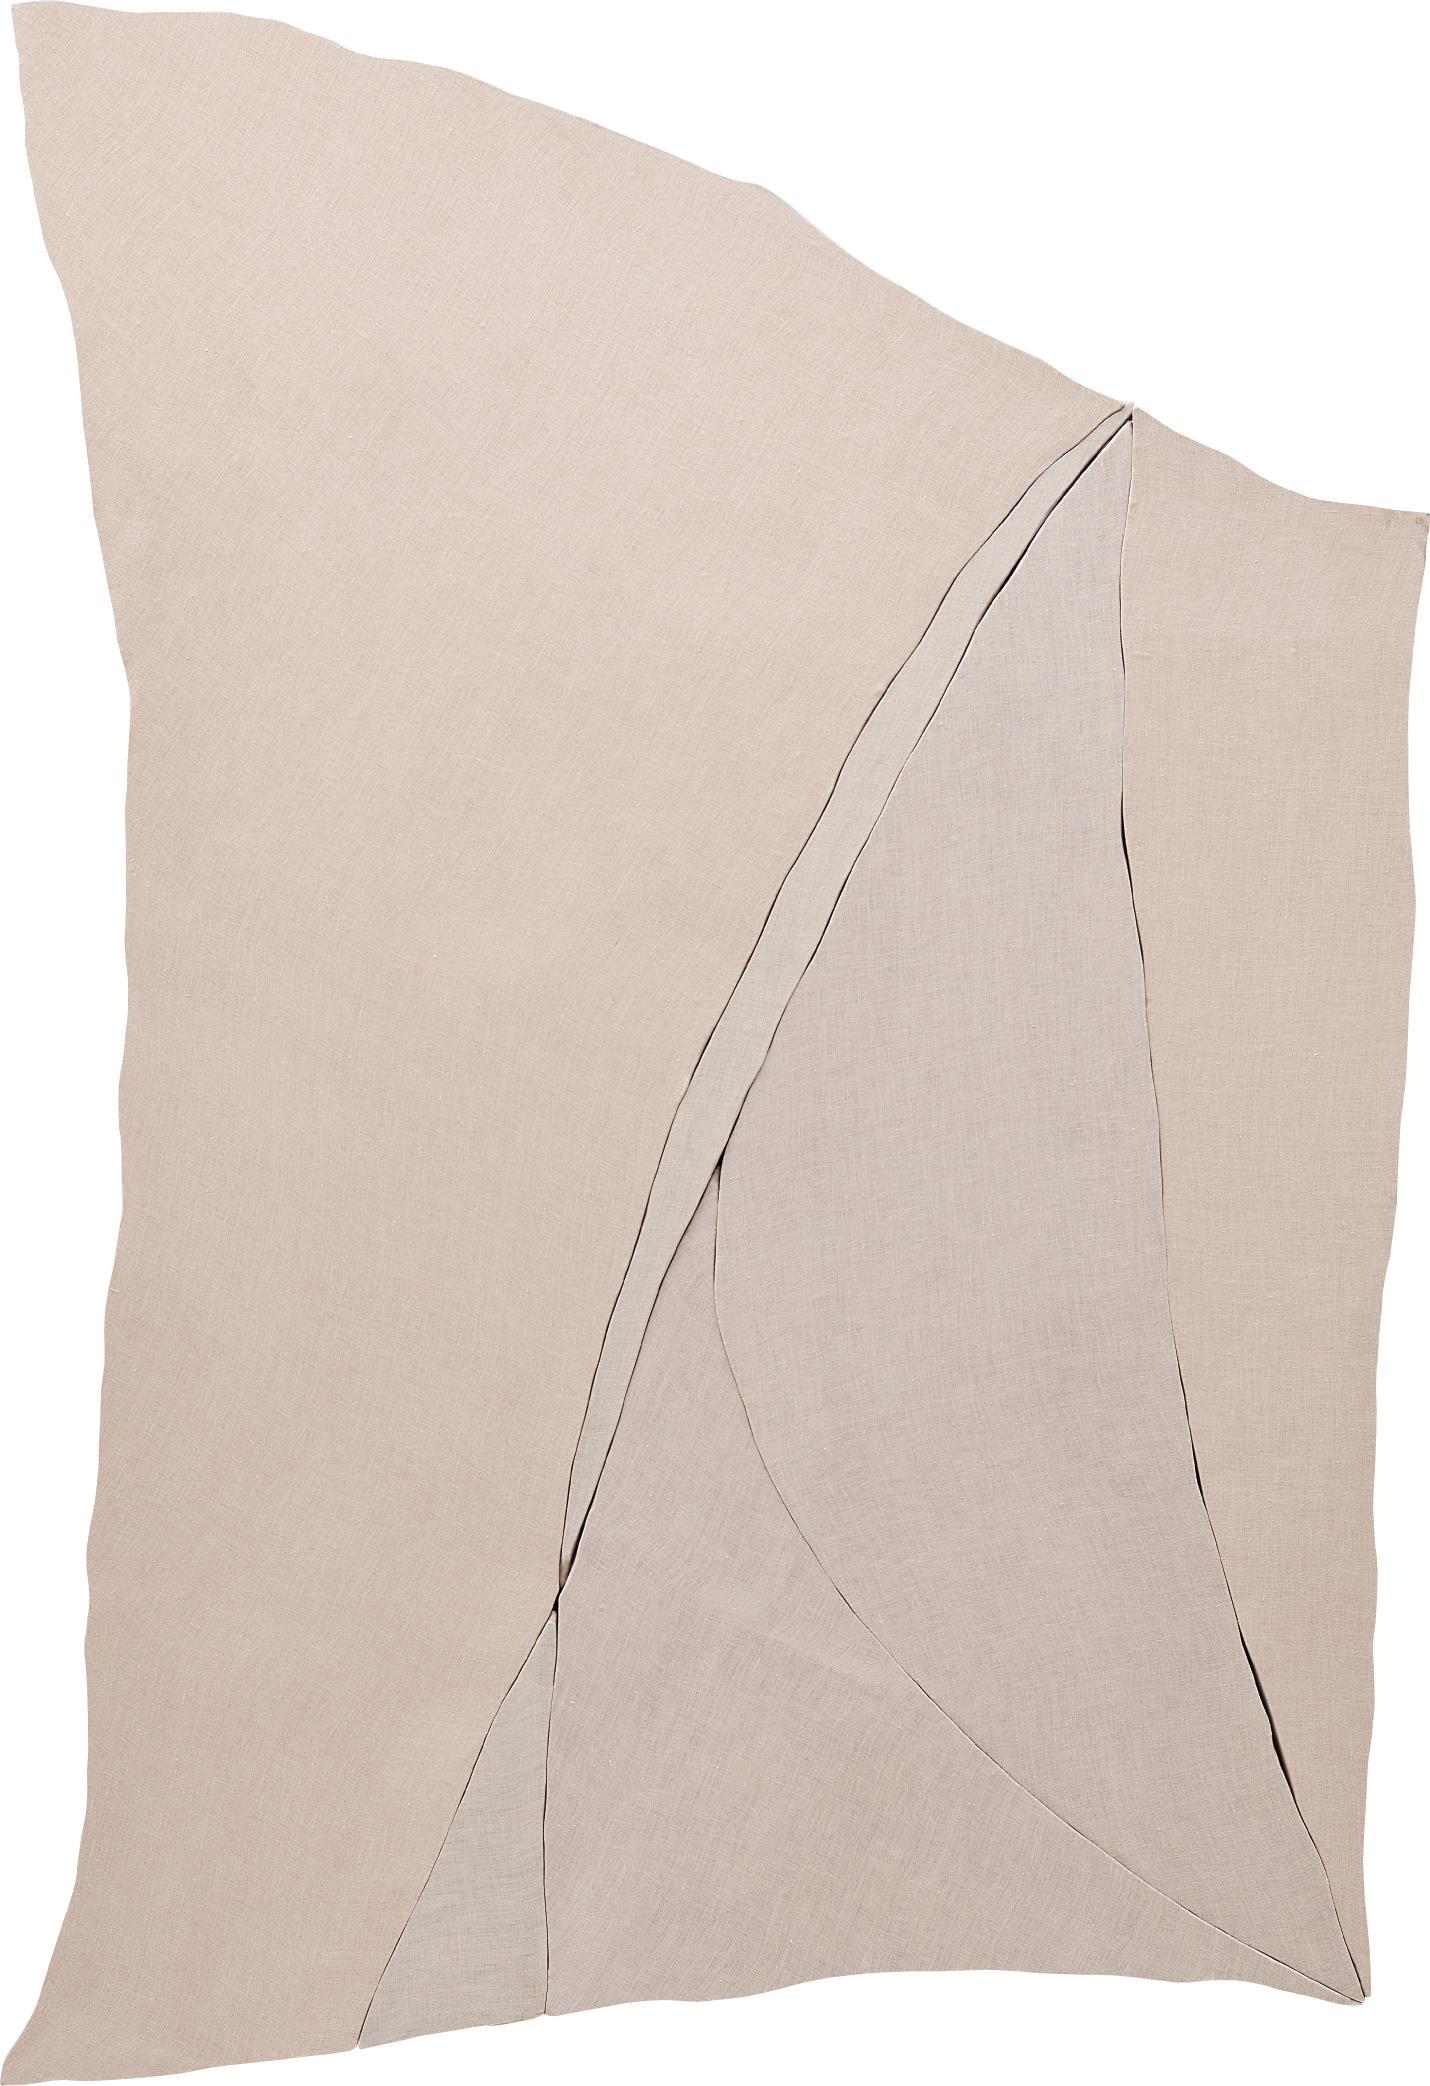 Wyatt Kahn-Untitled-2013